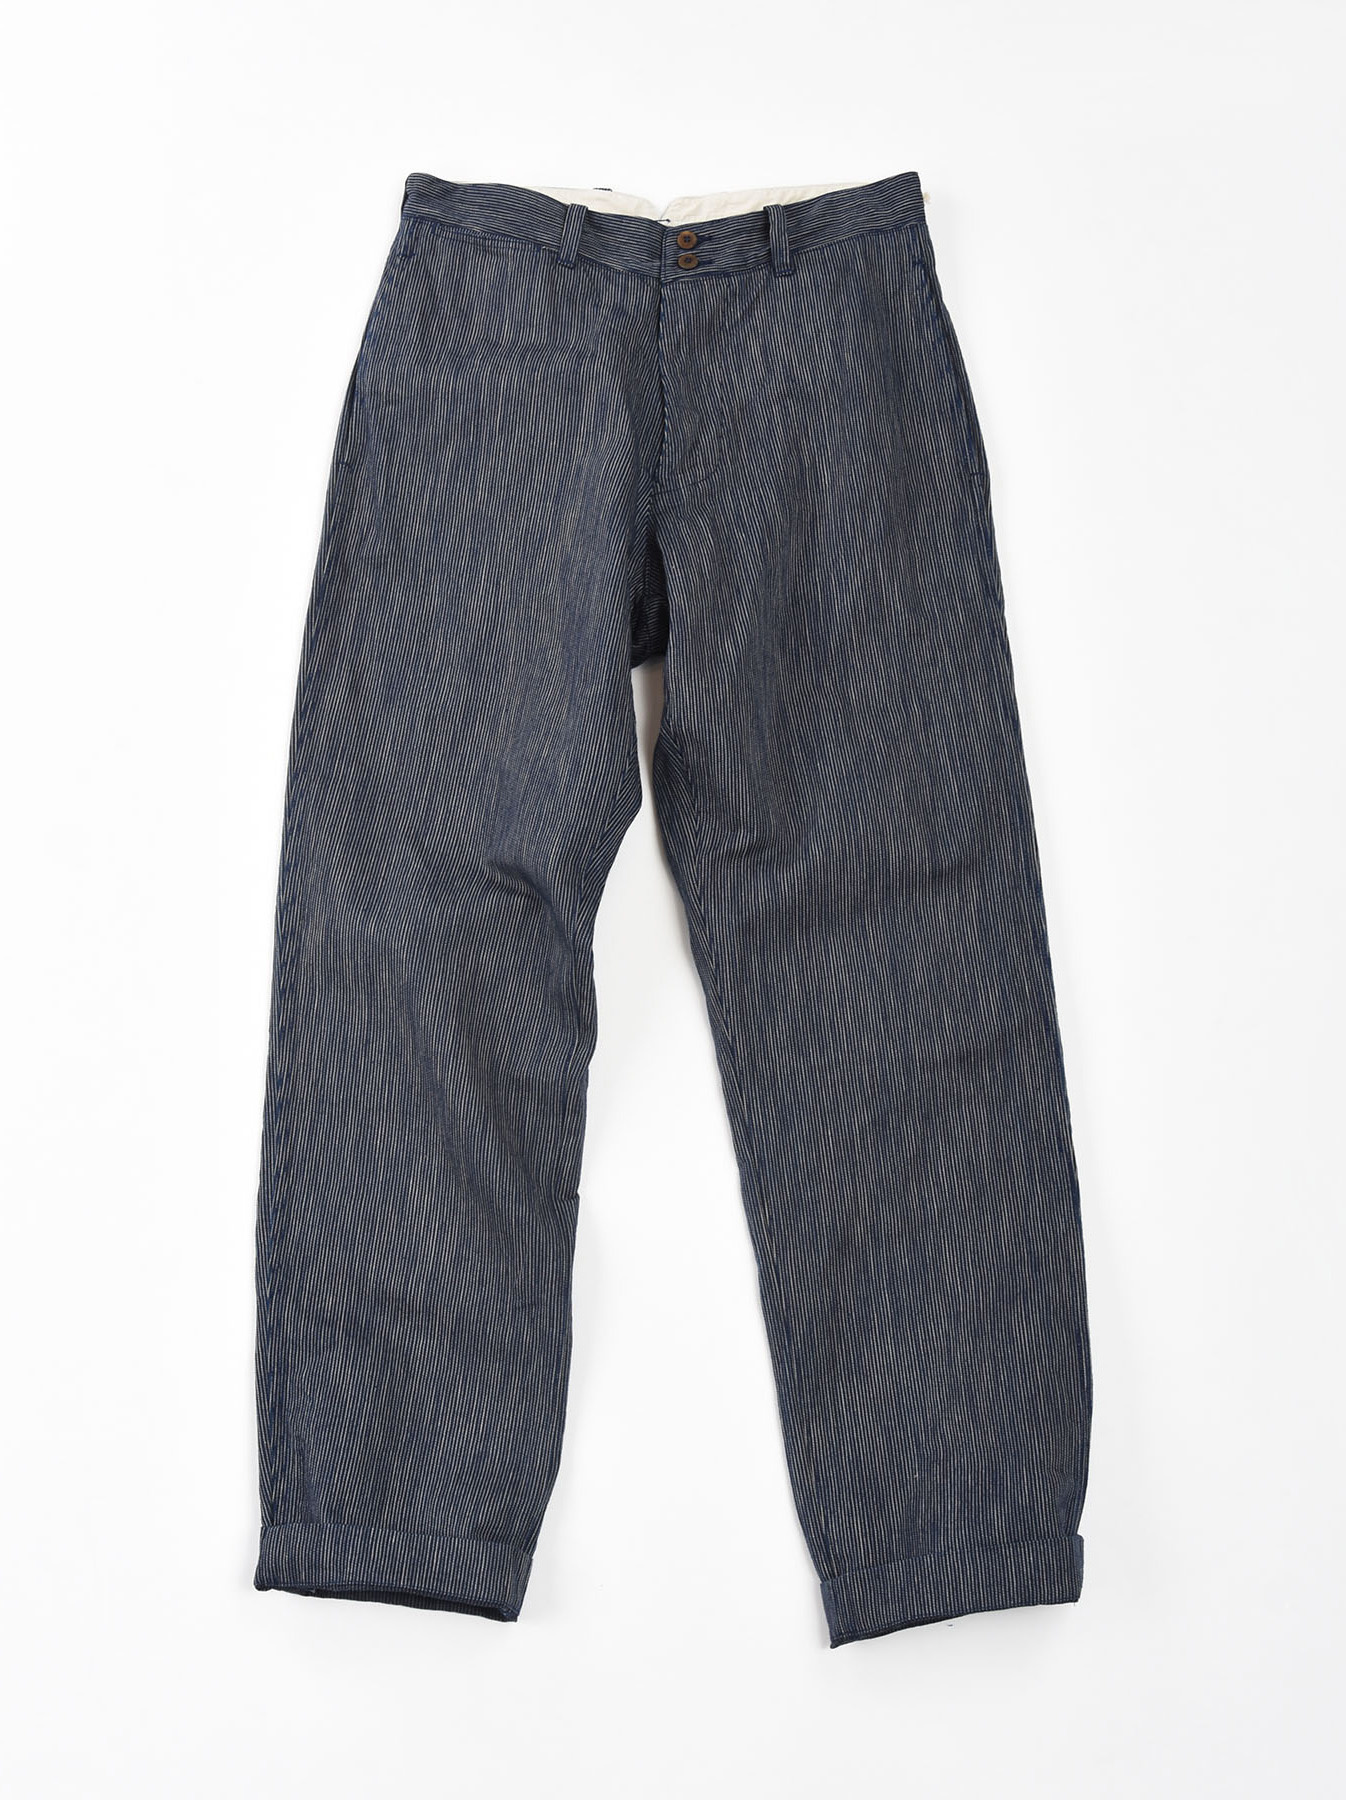 WH Indigo Mugi Yoko-shusi Work Pants-6